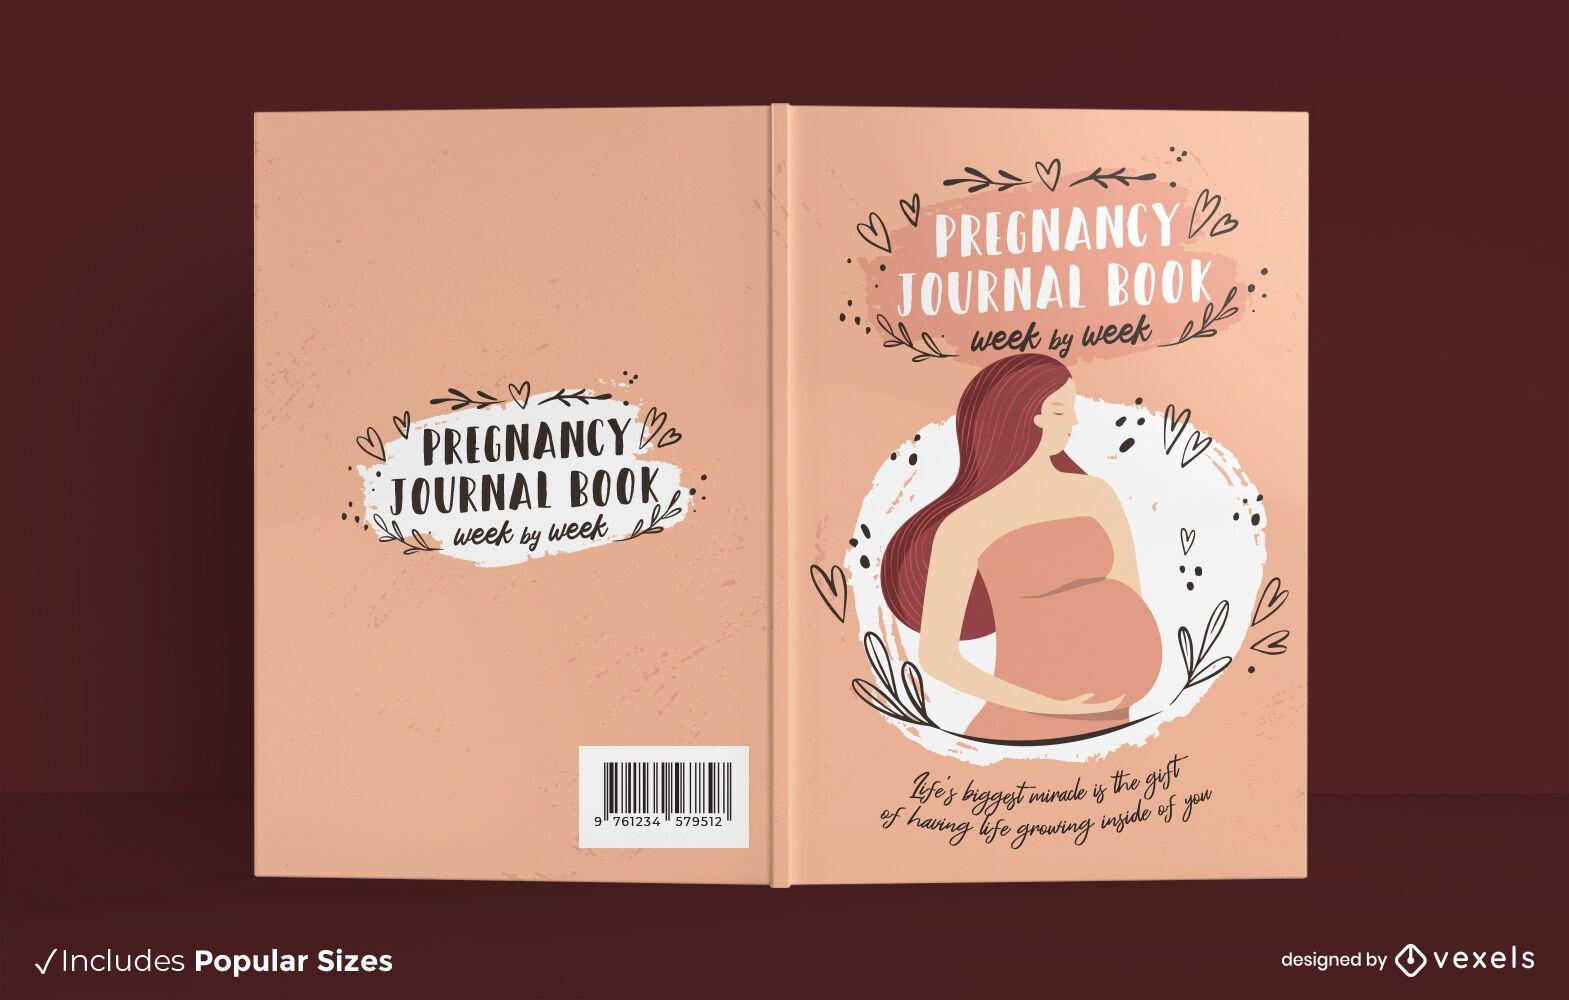 Pregnancy journal book cover design